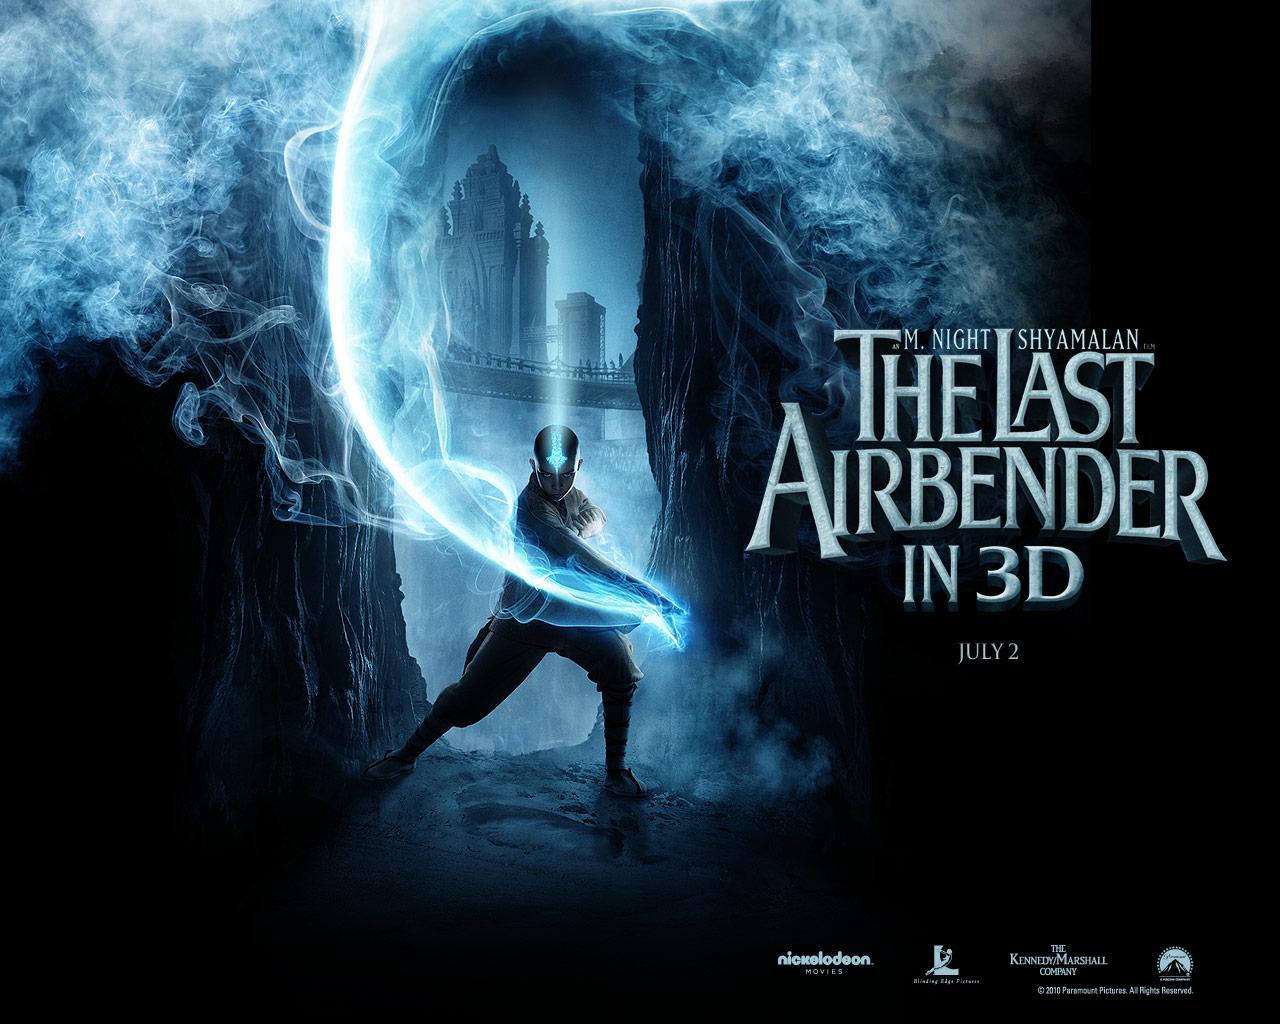 Avatar The Last Airbender Movie 2 29 Hd Wallpaper ...The Last Airbender 2 Movie